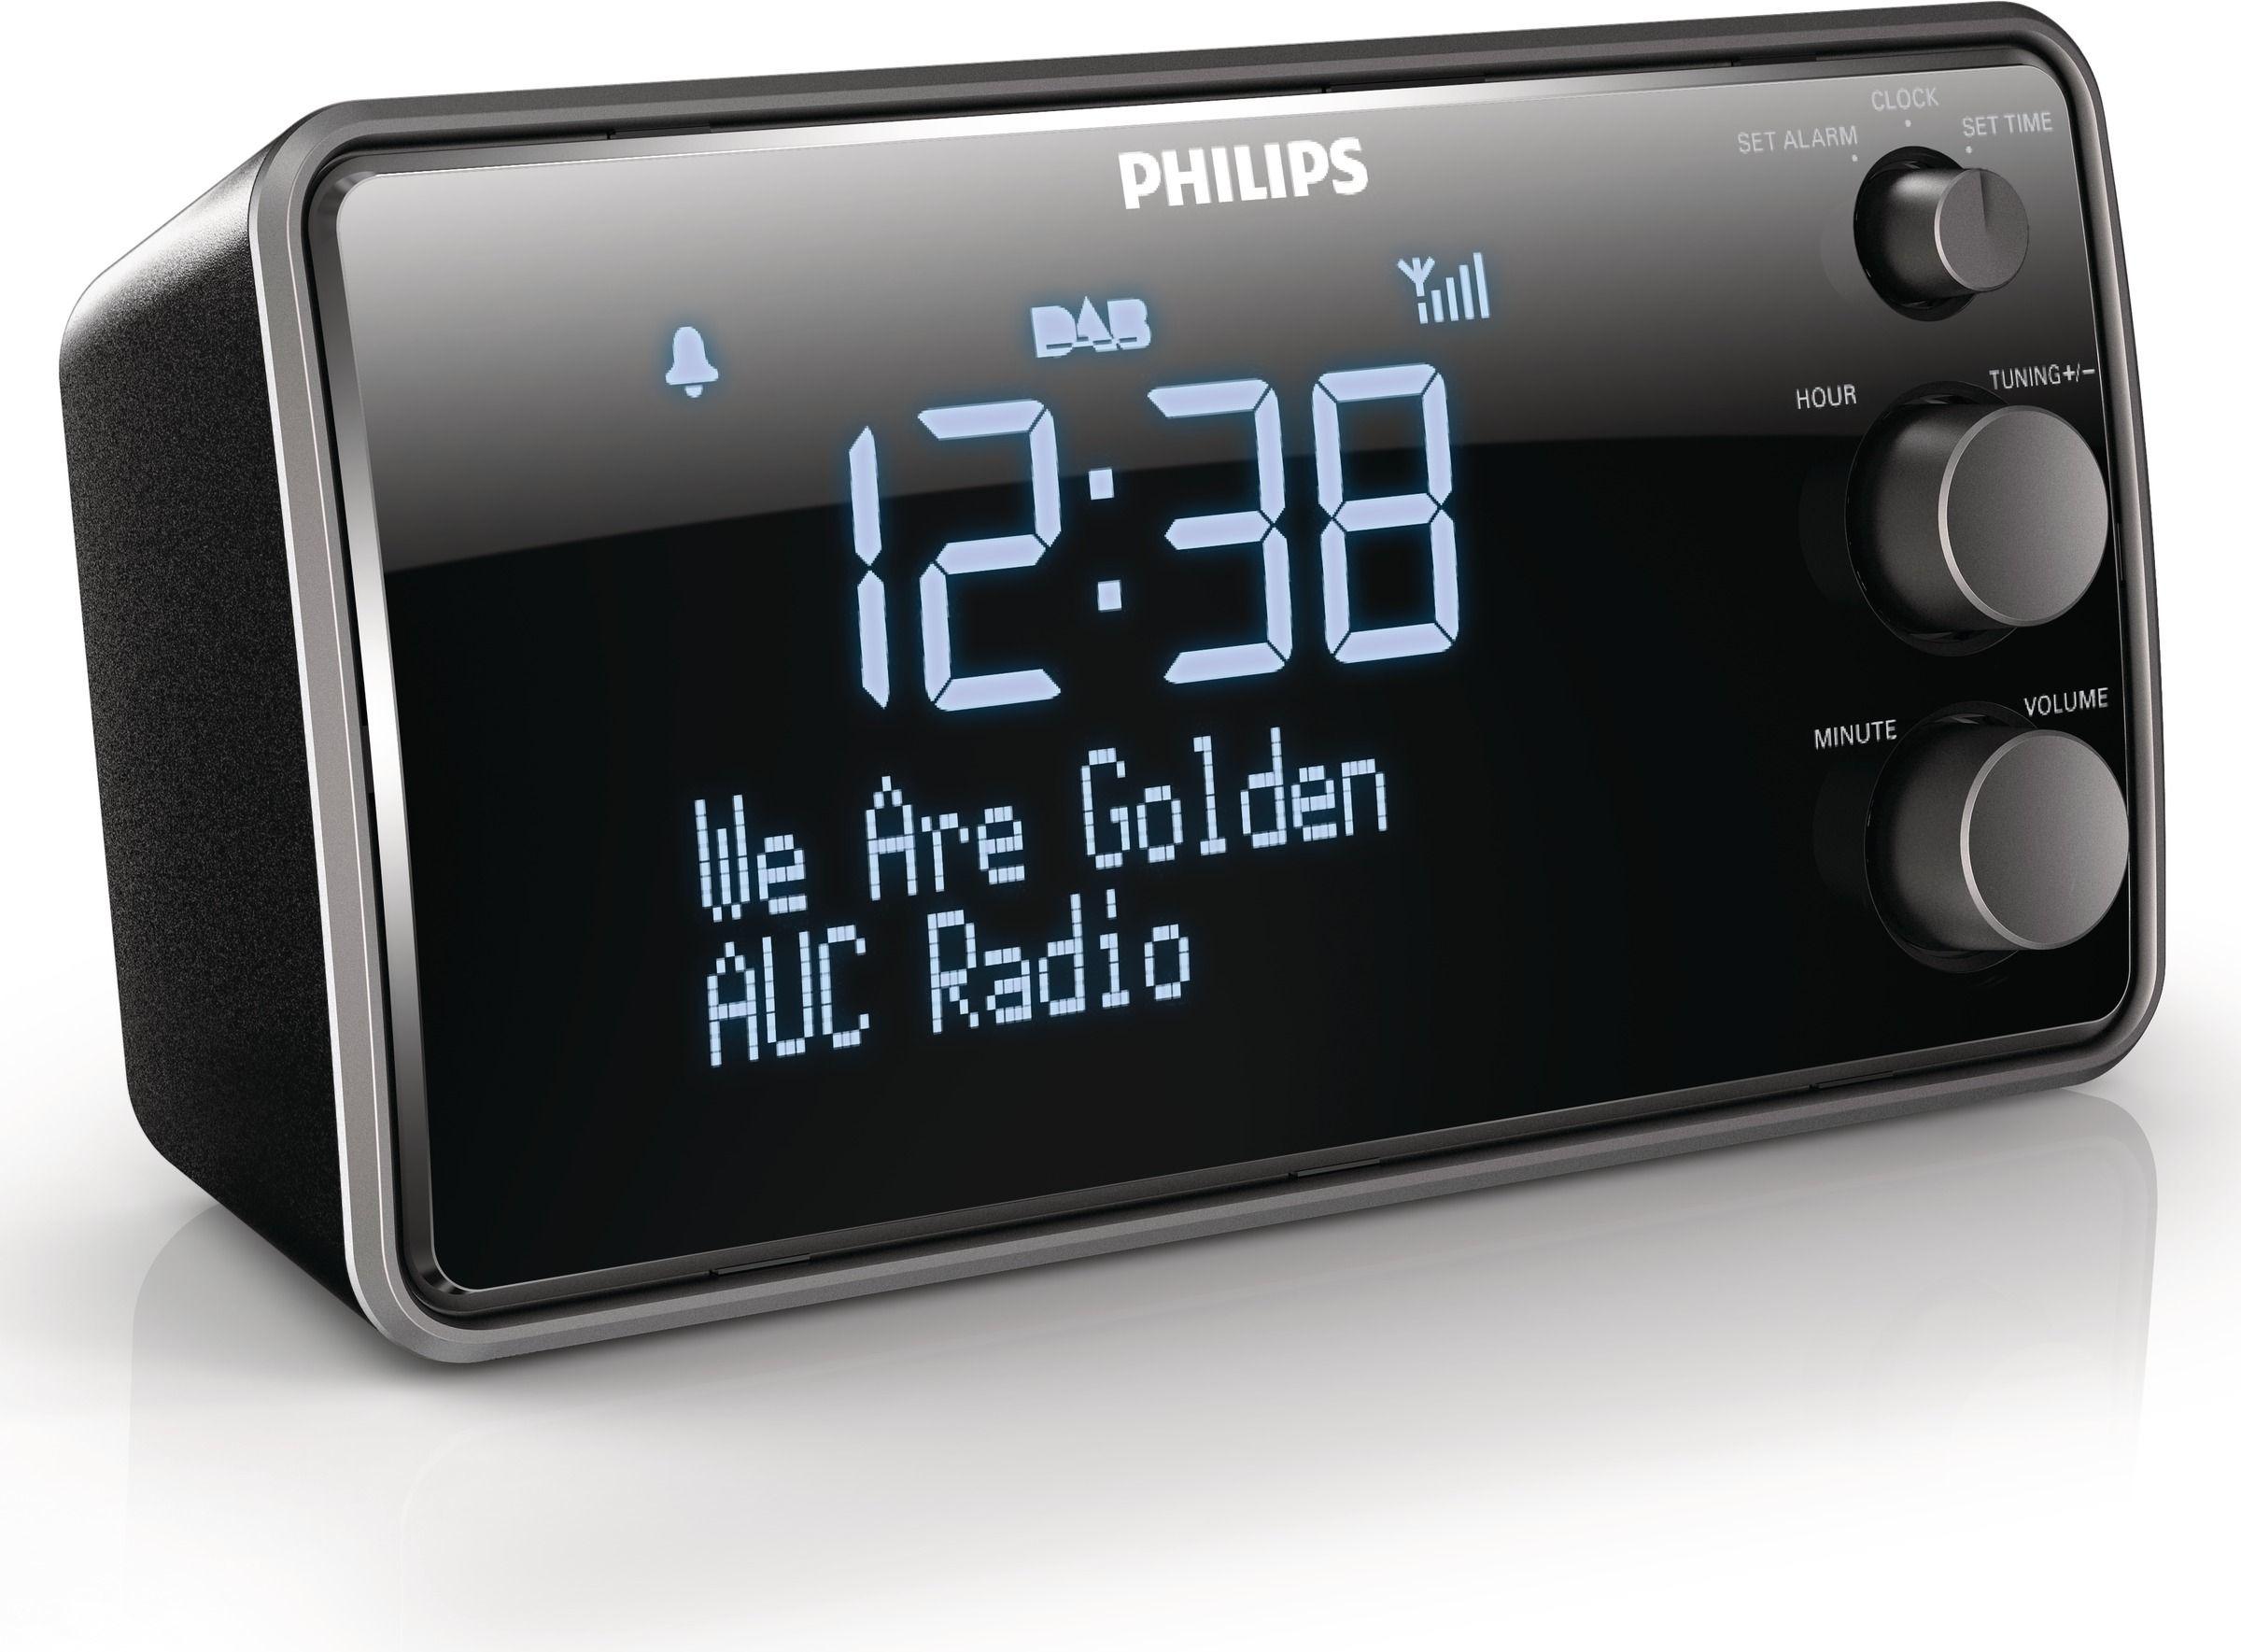 Philips AJB3552-12